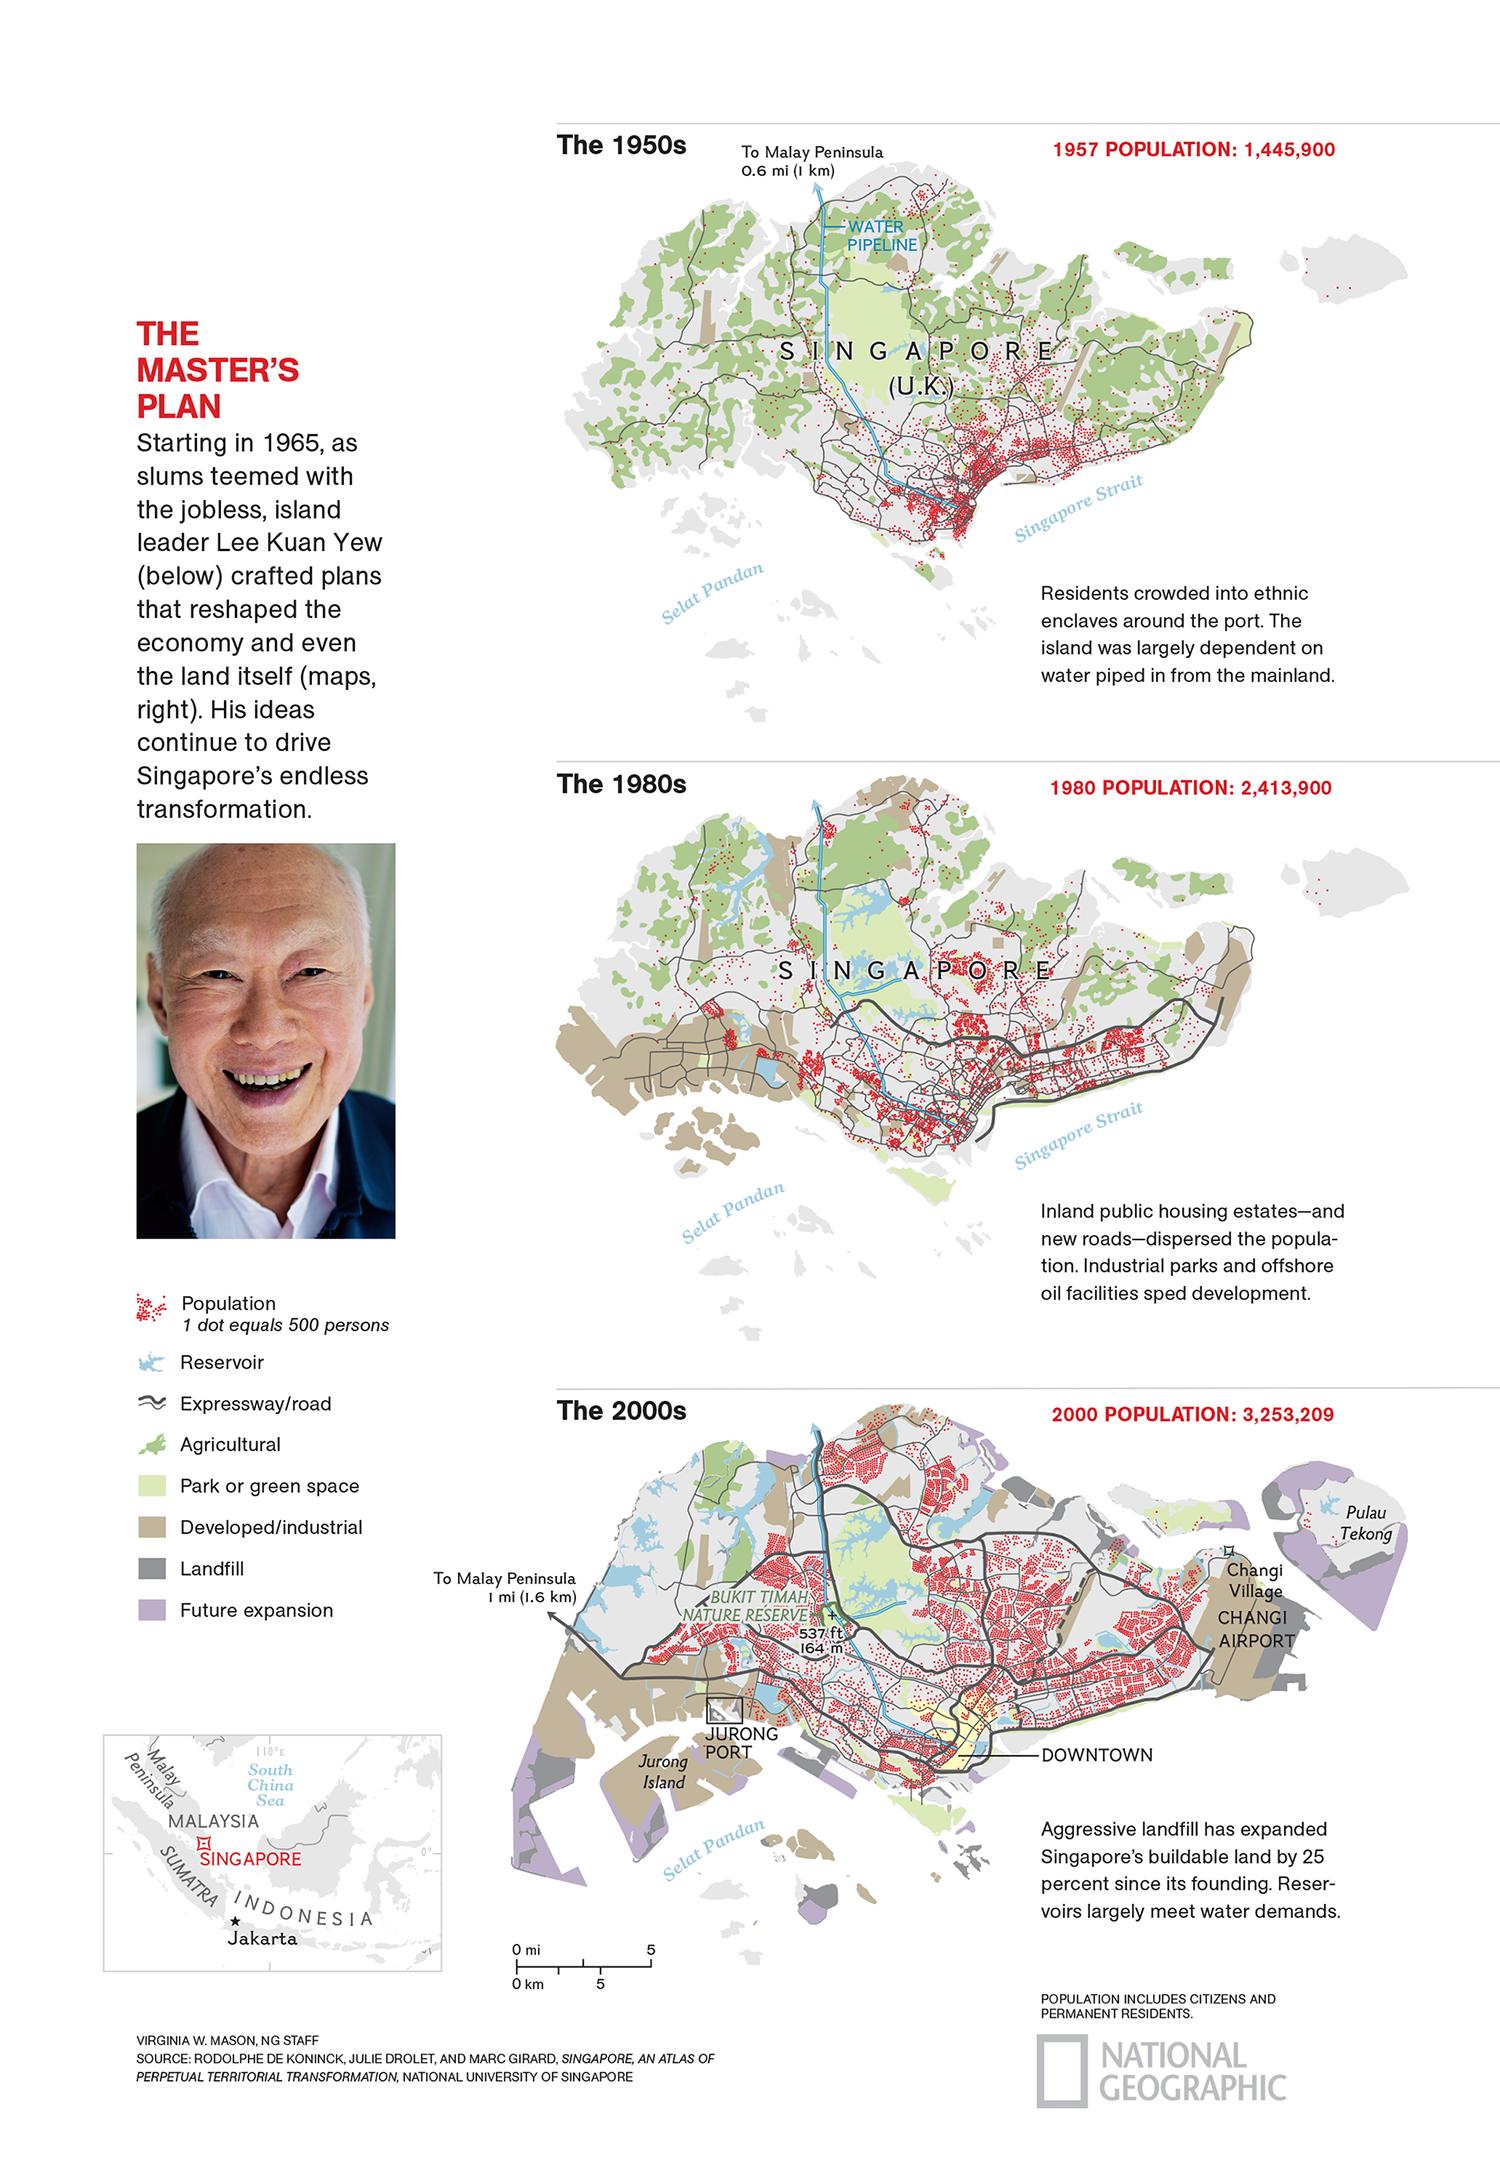 Singapore: The Master's Plan